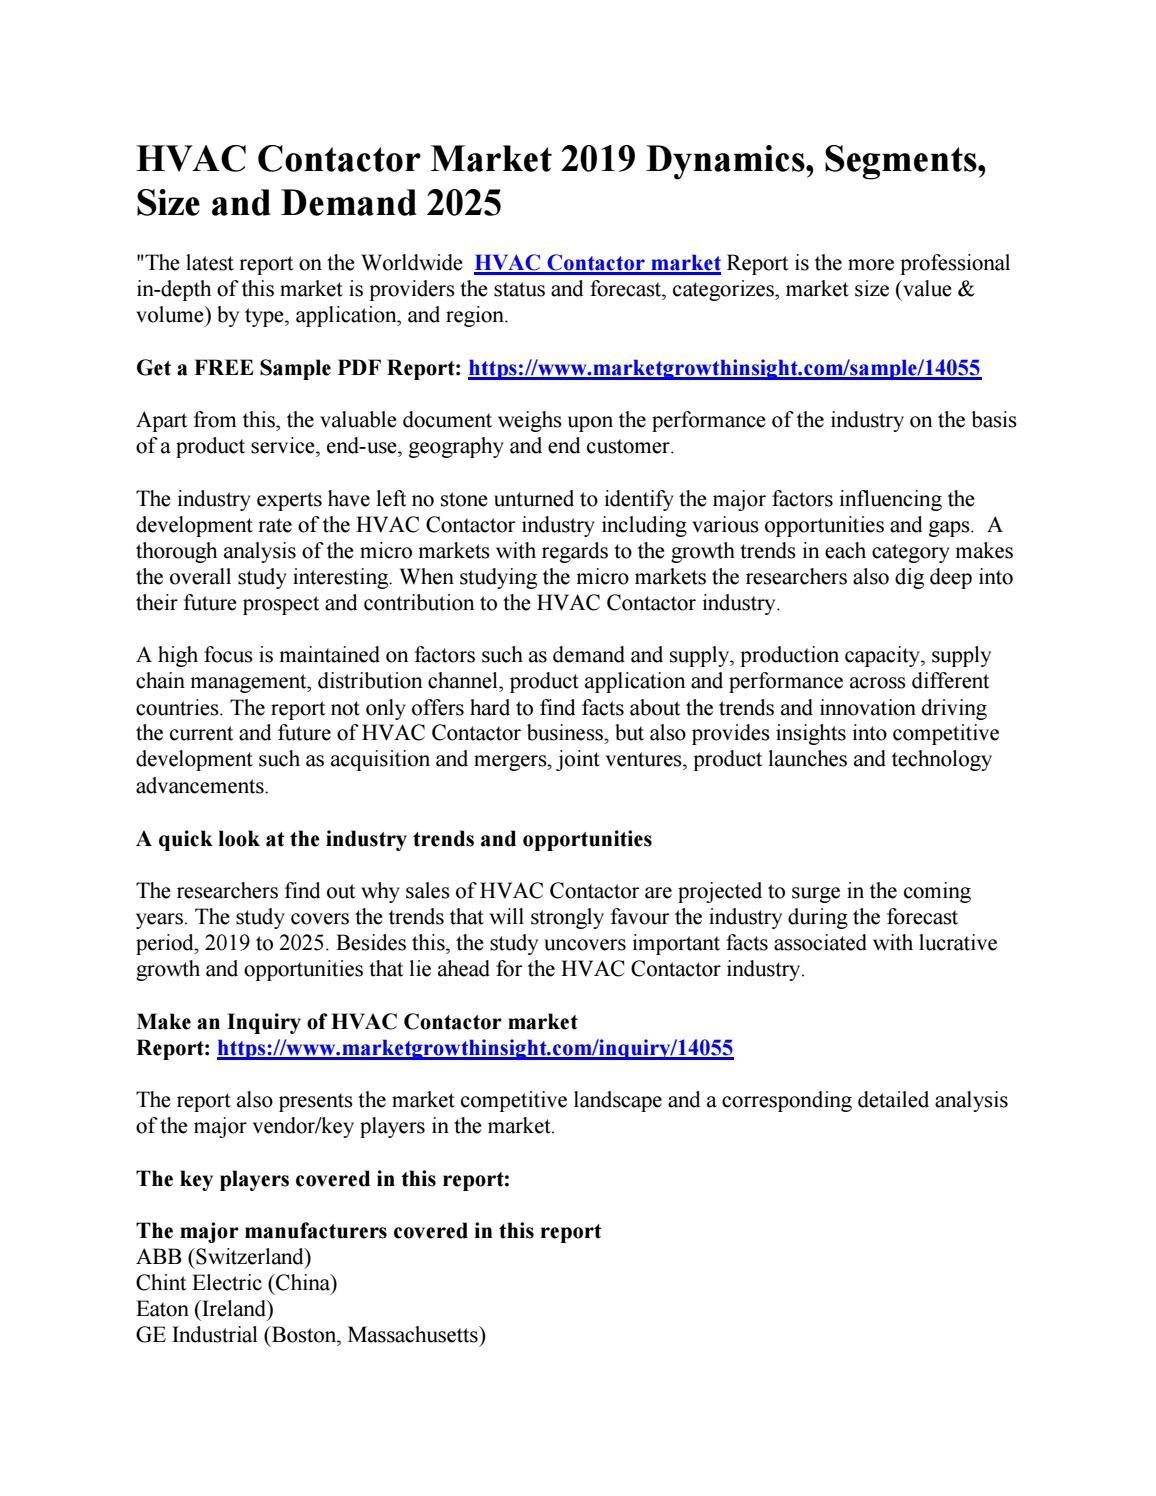 HVAC Contactor Market 2019 Dynamics, Segments, Size and